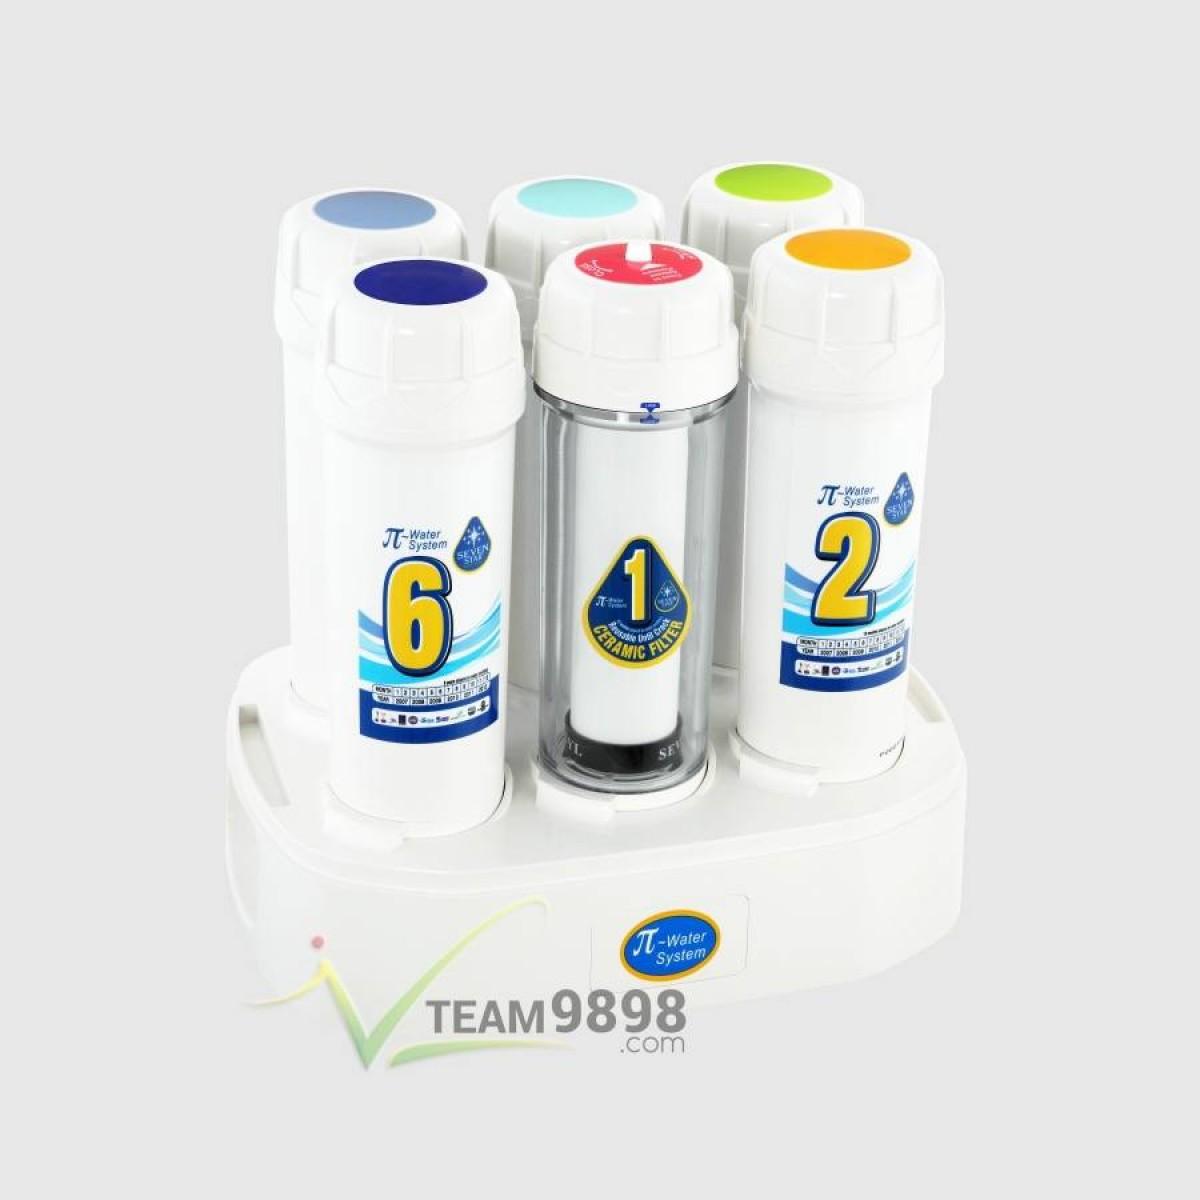 Seven Star Water Filter 2